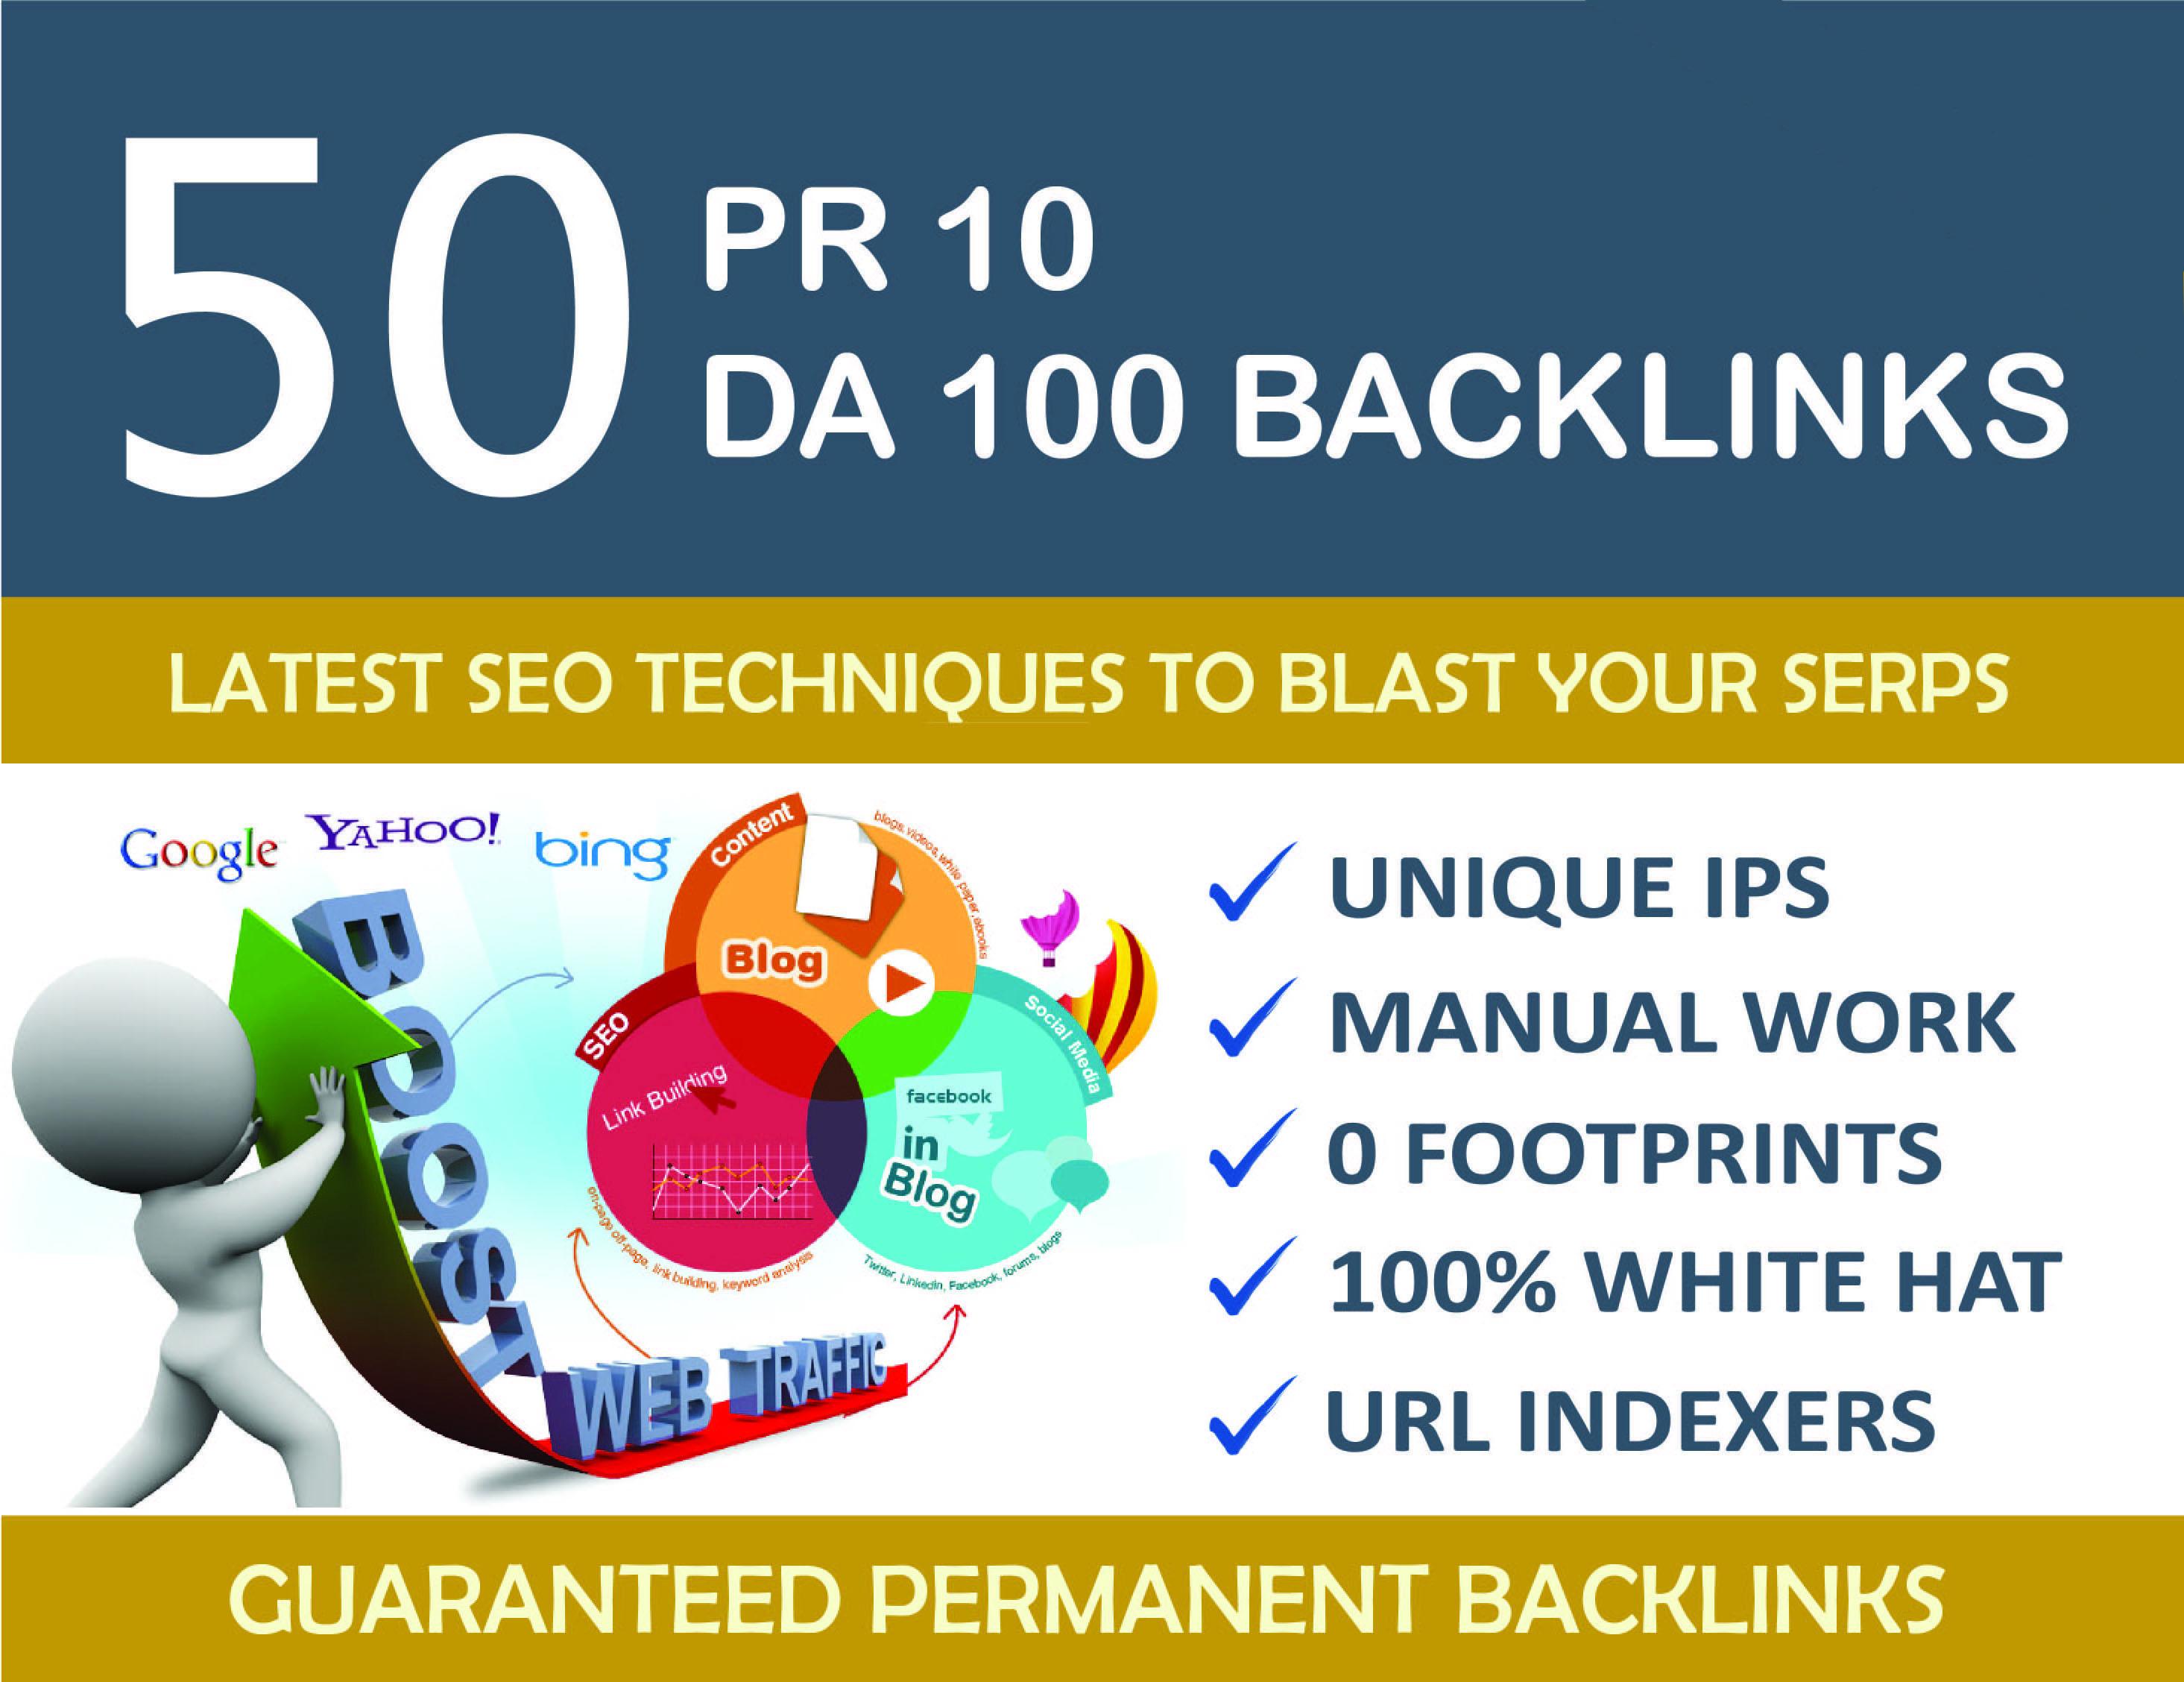 Create 50 Unique Pr10 SEO Backlinks On Da100 Sites